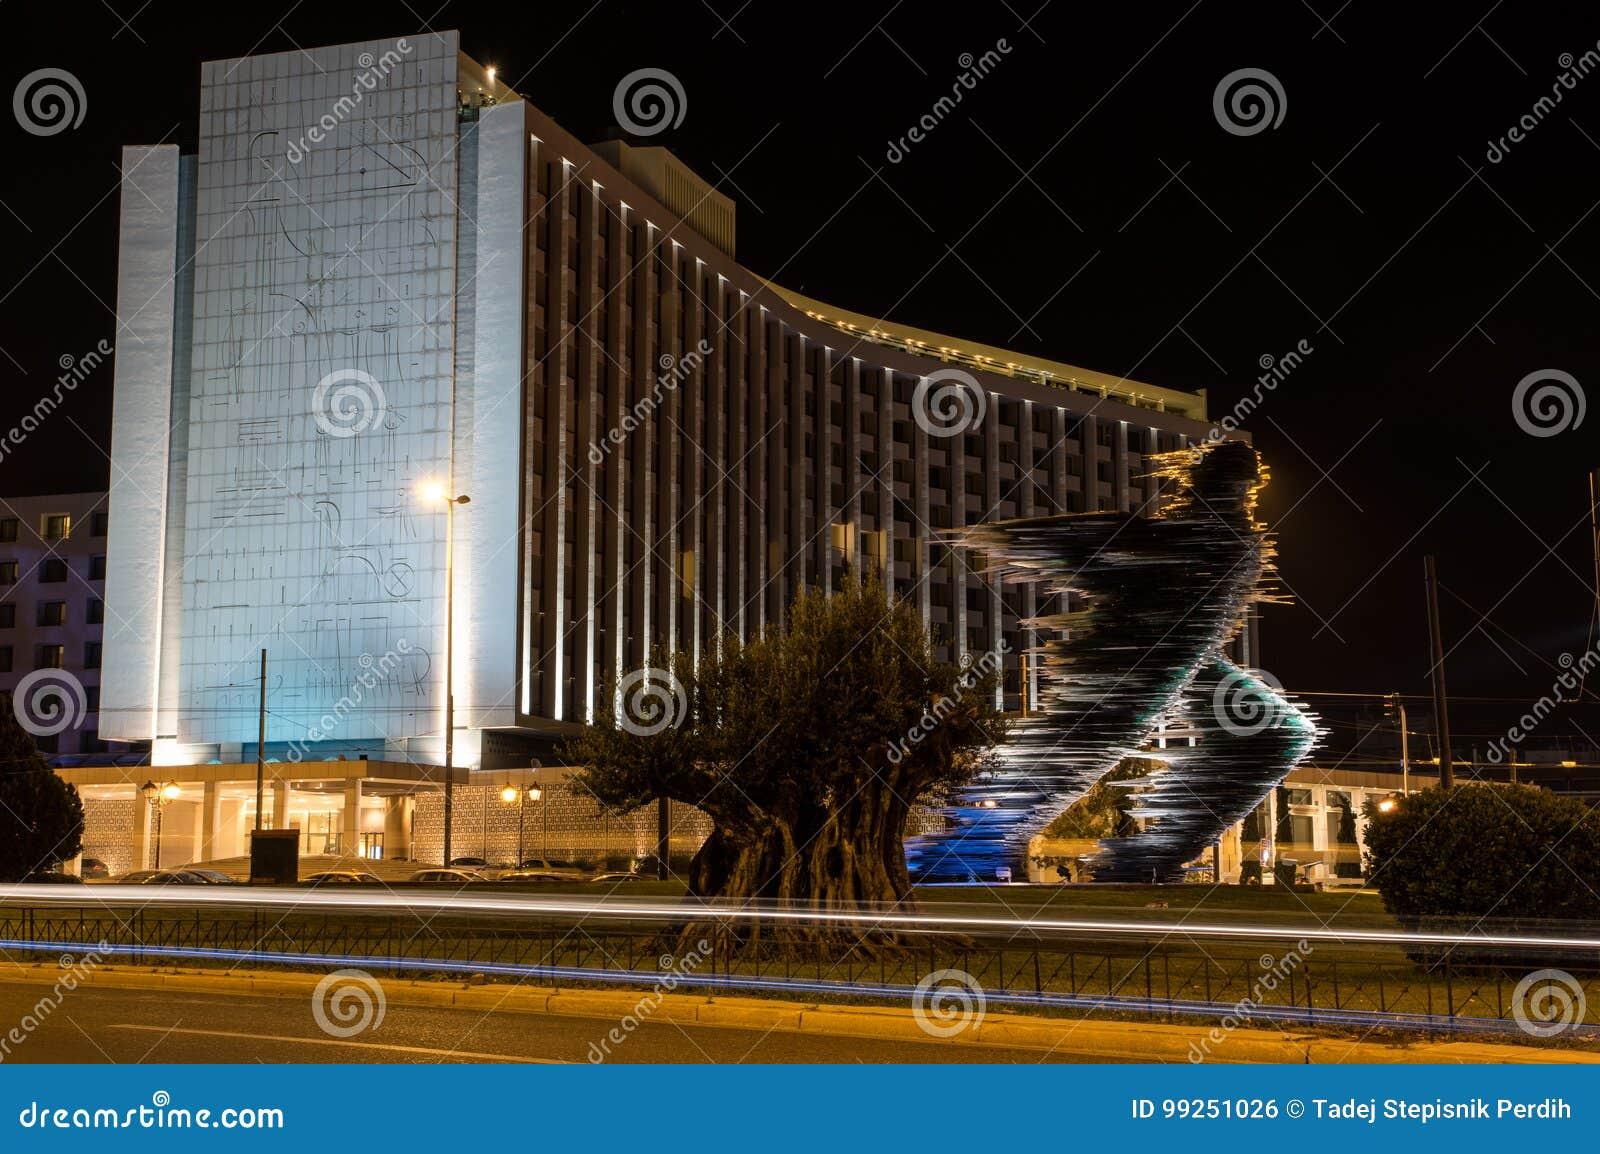 Agentstandbeeld in Athene bij nacht